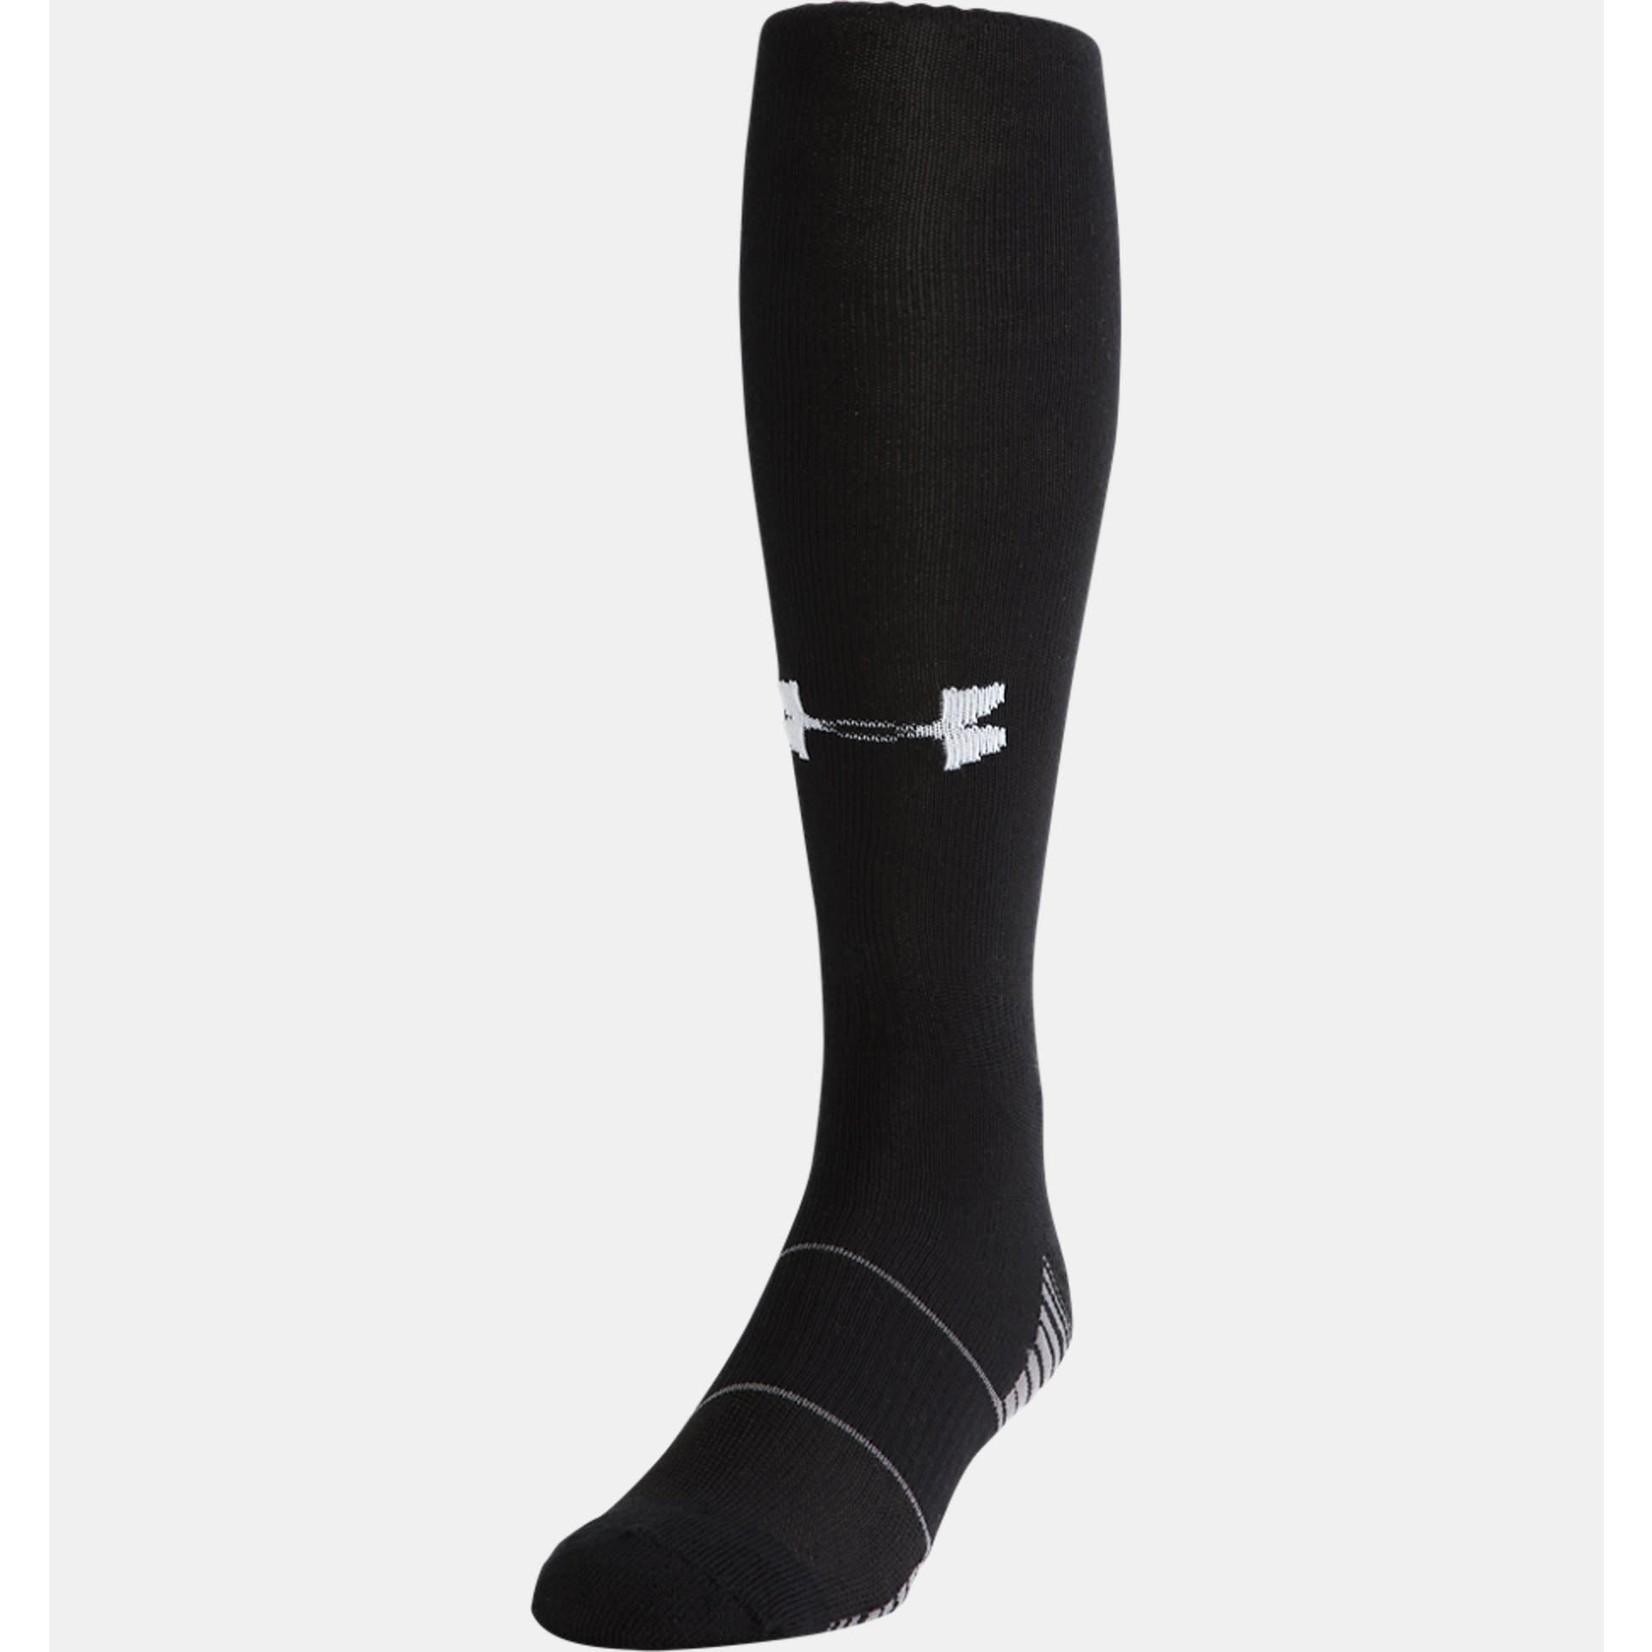 Under Armour Under Armour Socks, Soccer Over-The-Calf, Adult